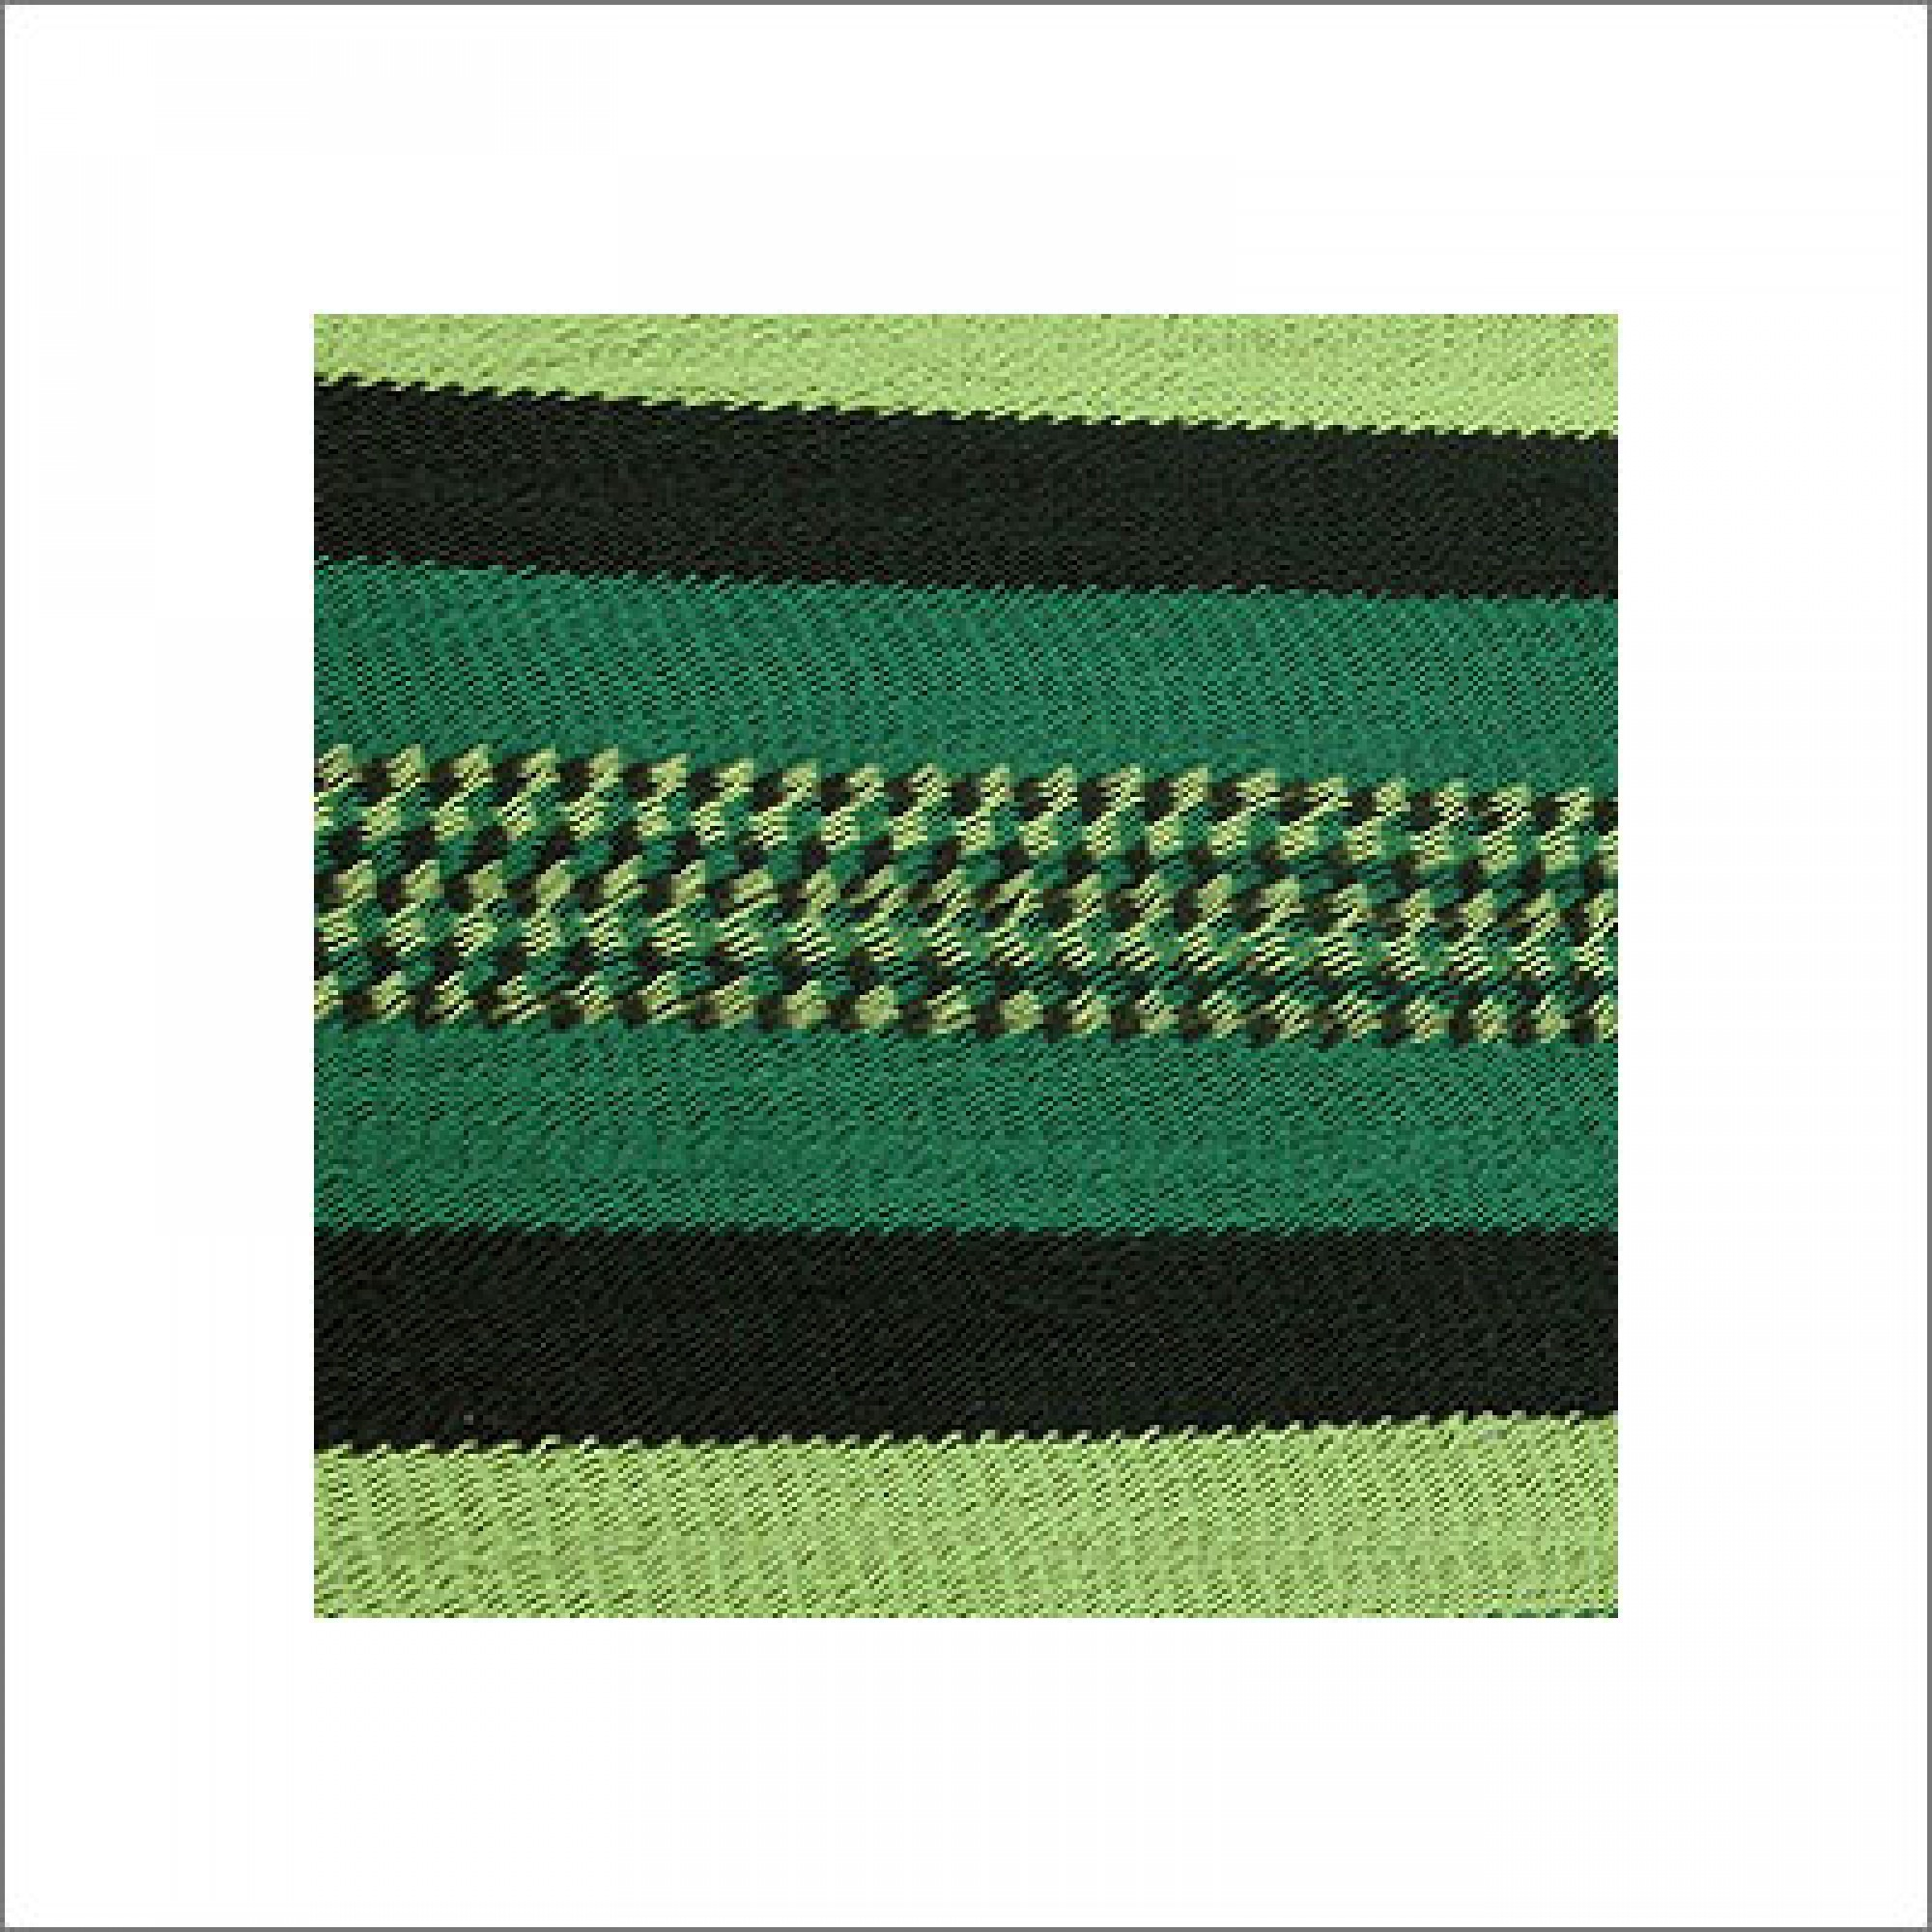 Mayan Crochet Hammock Emerald